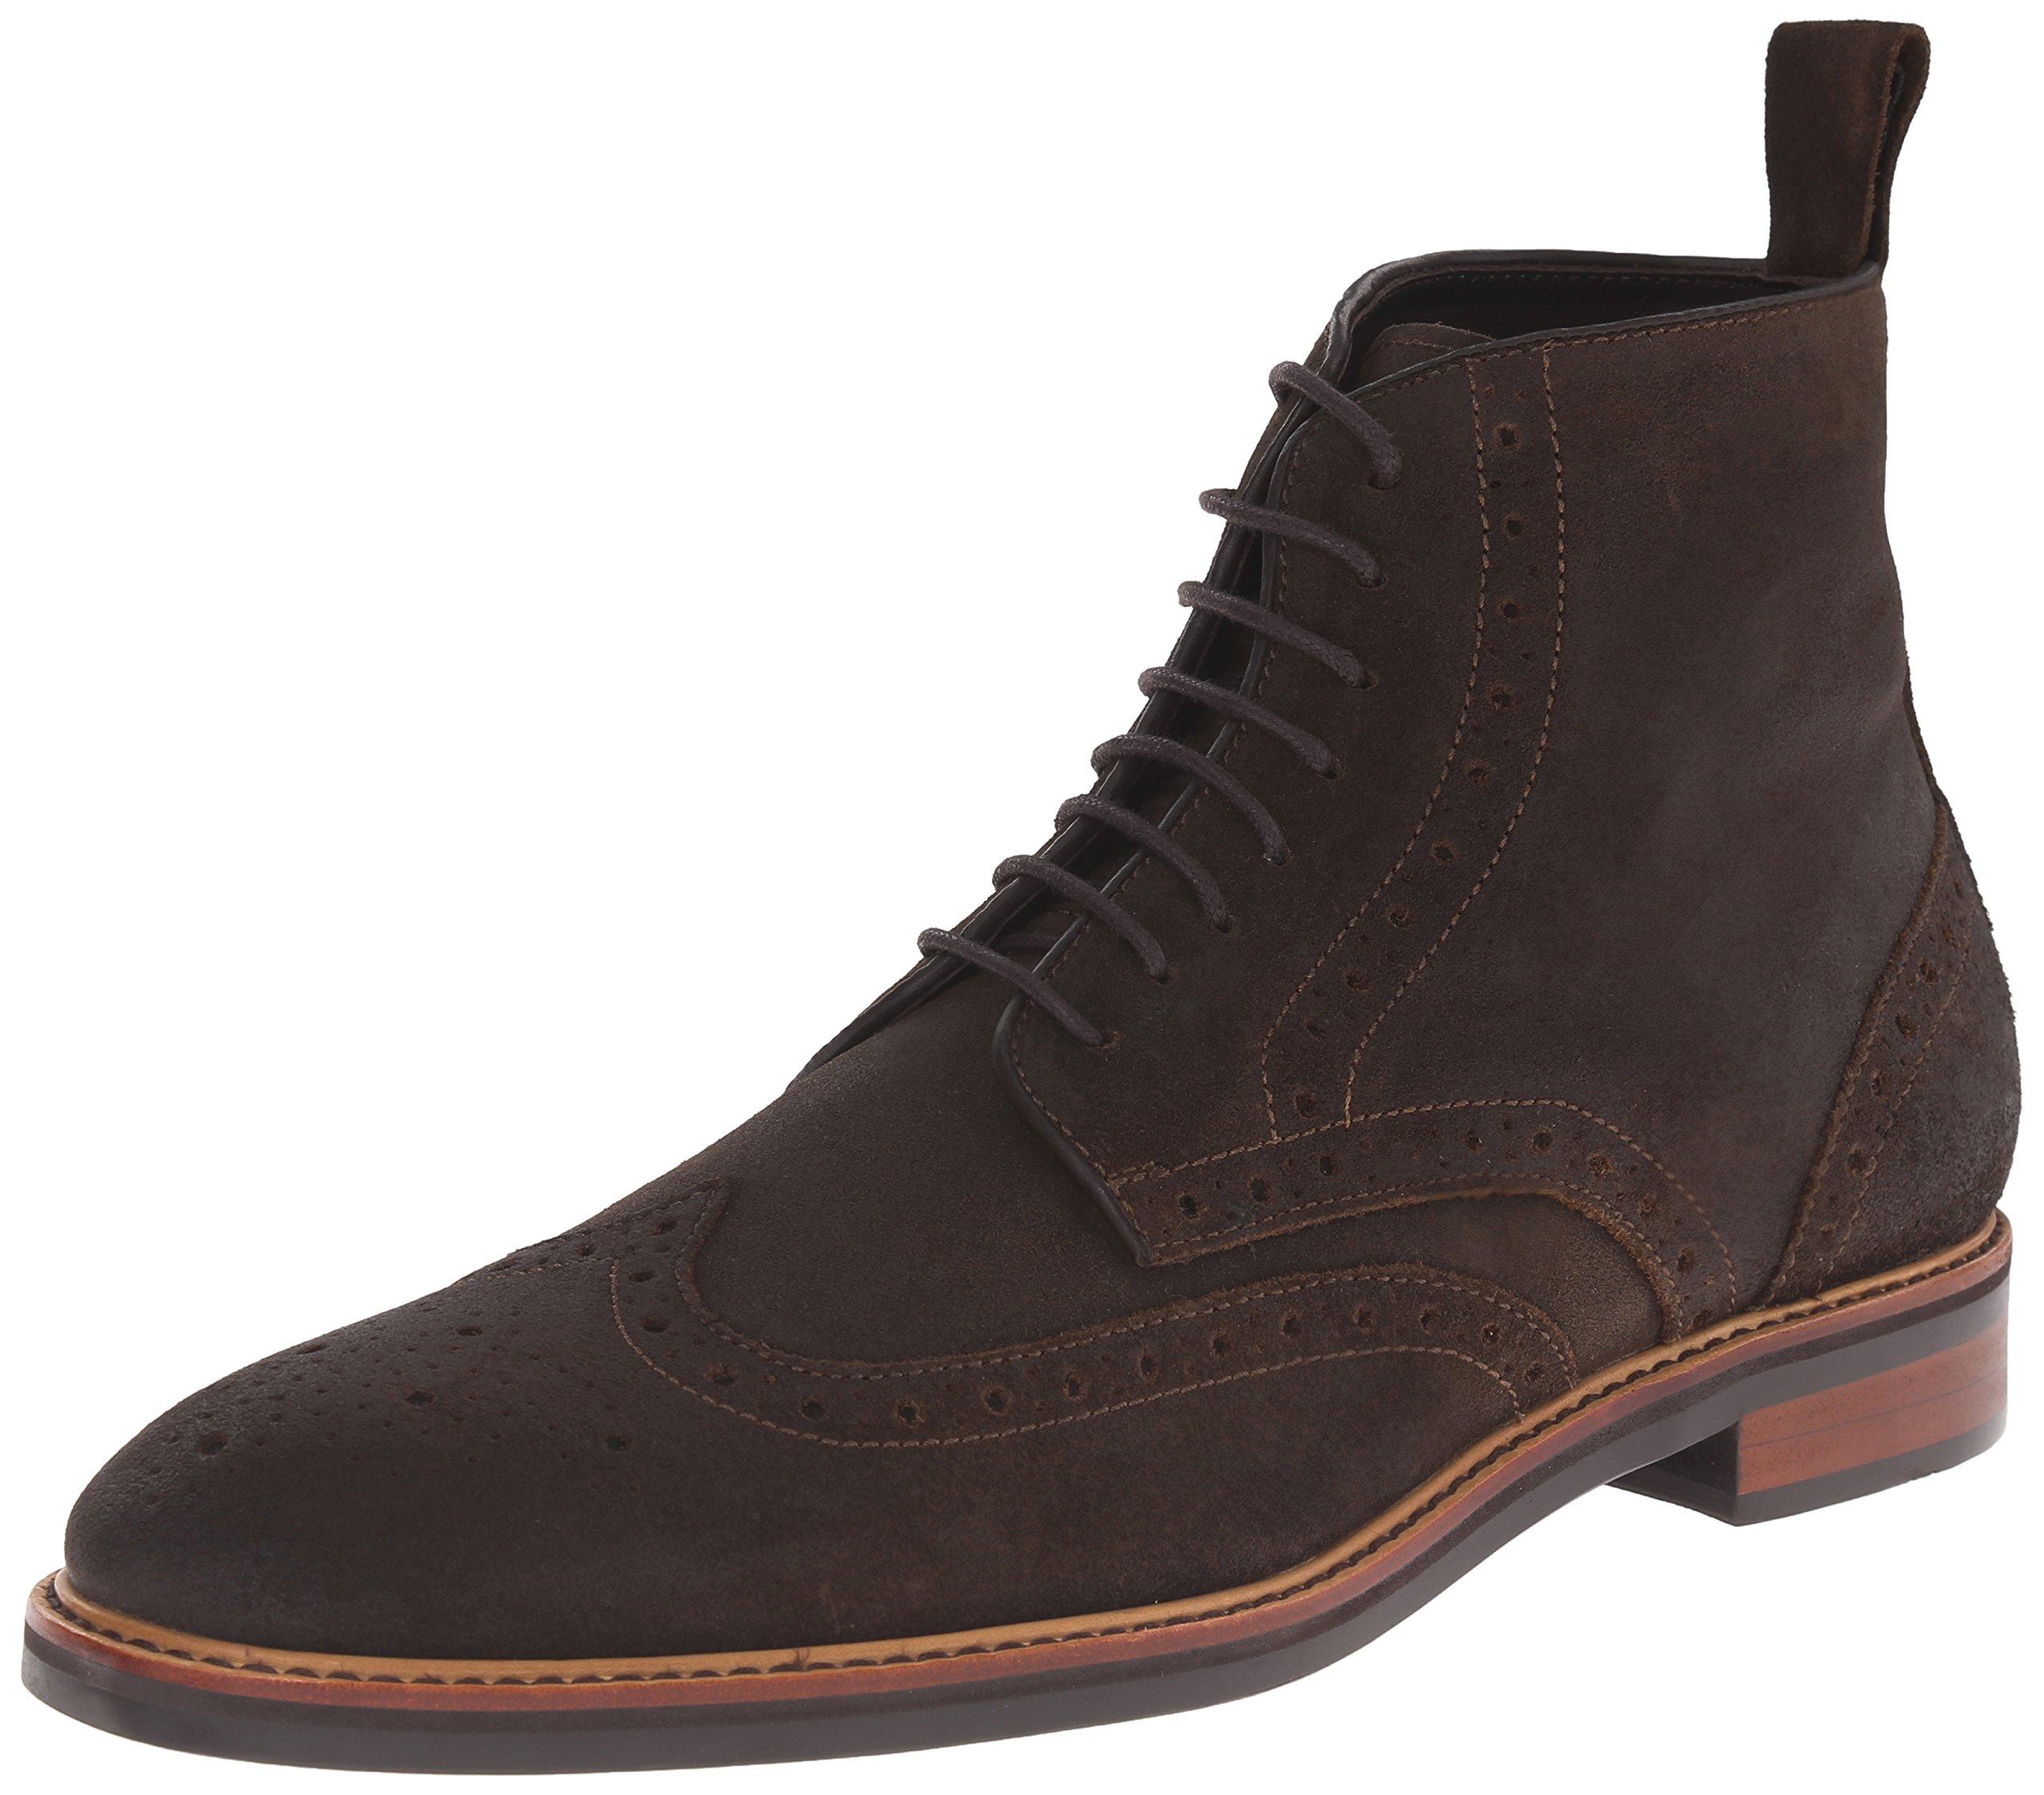 Gordon Rush Men's Stiles Engineer Boot, Dark Brown, 13 M US